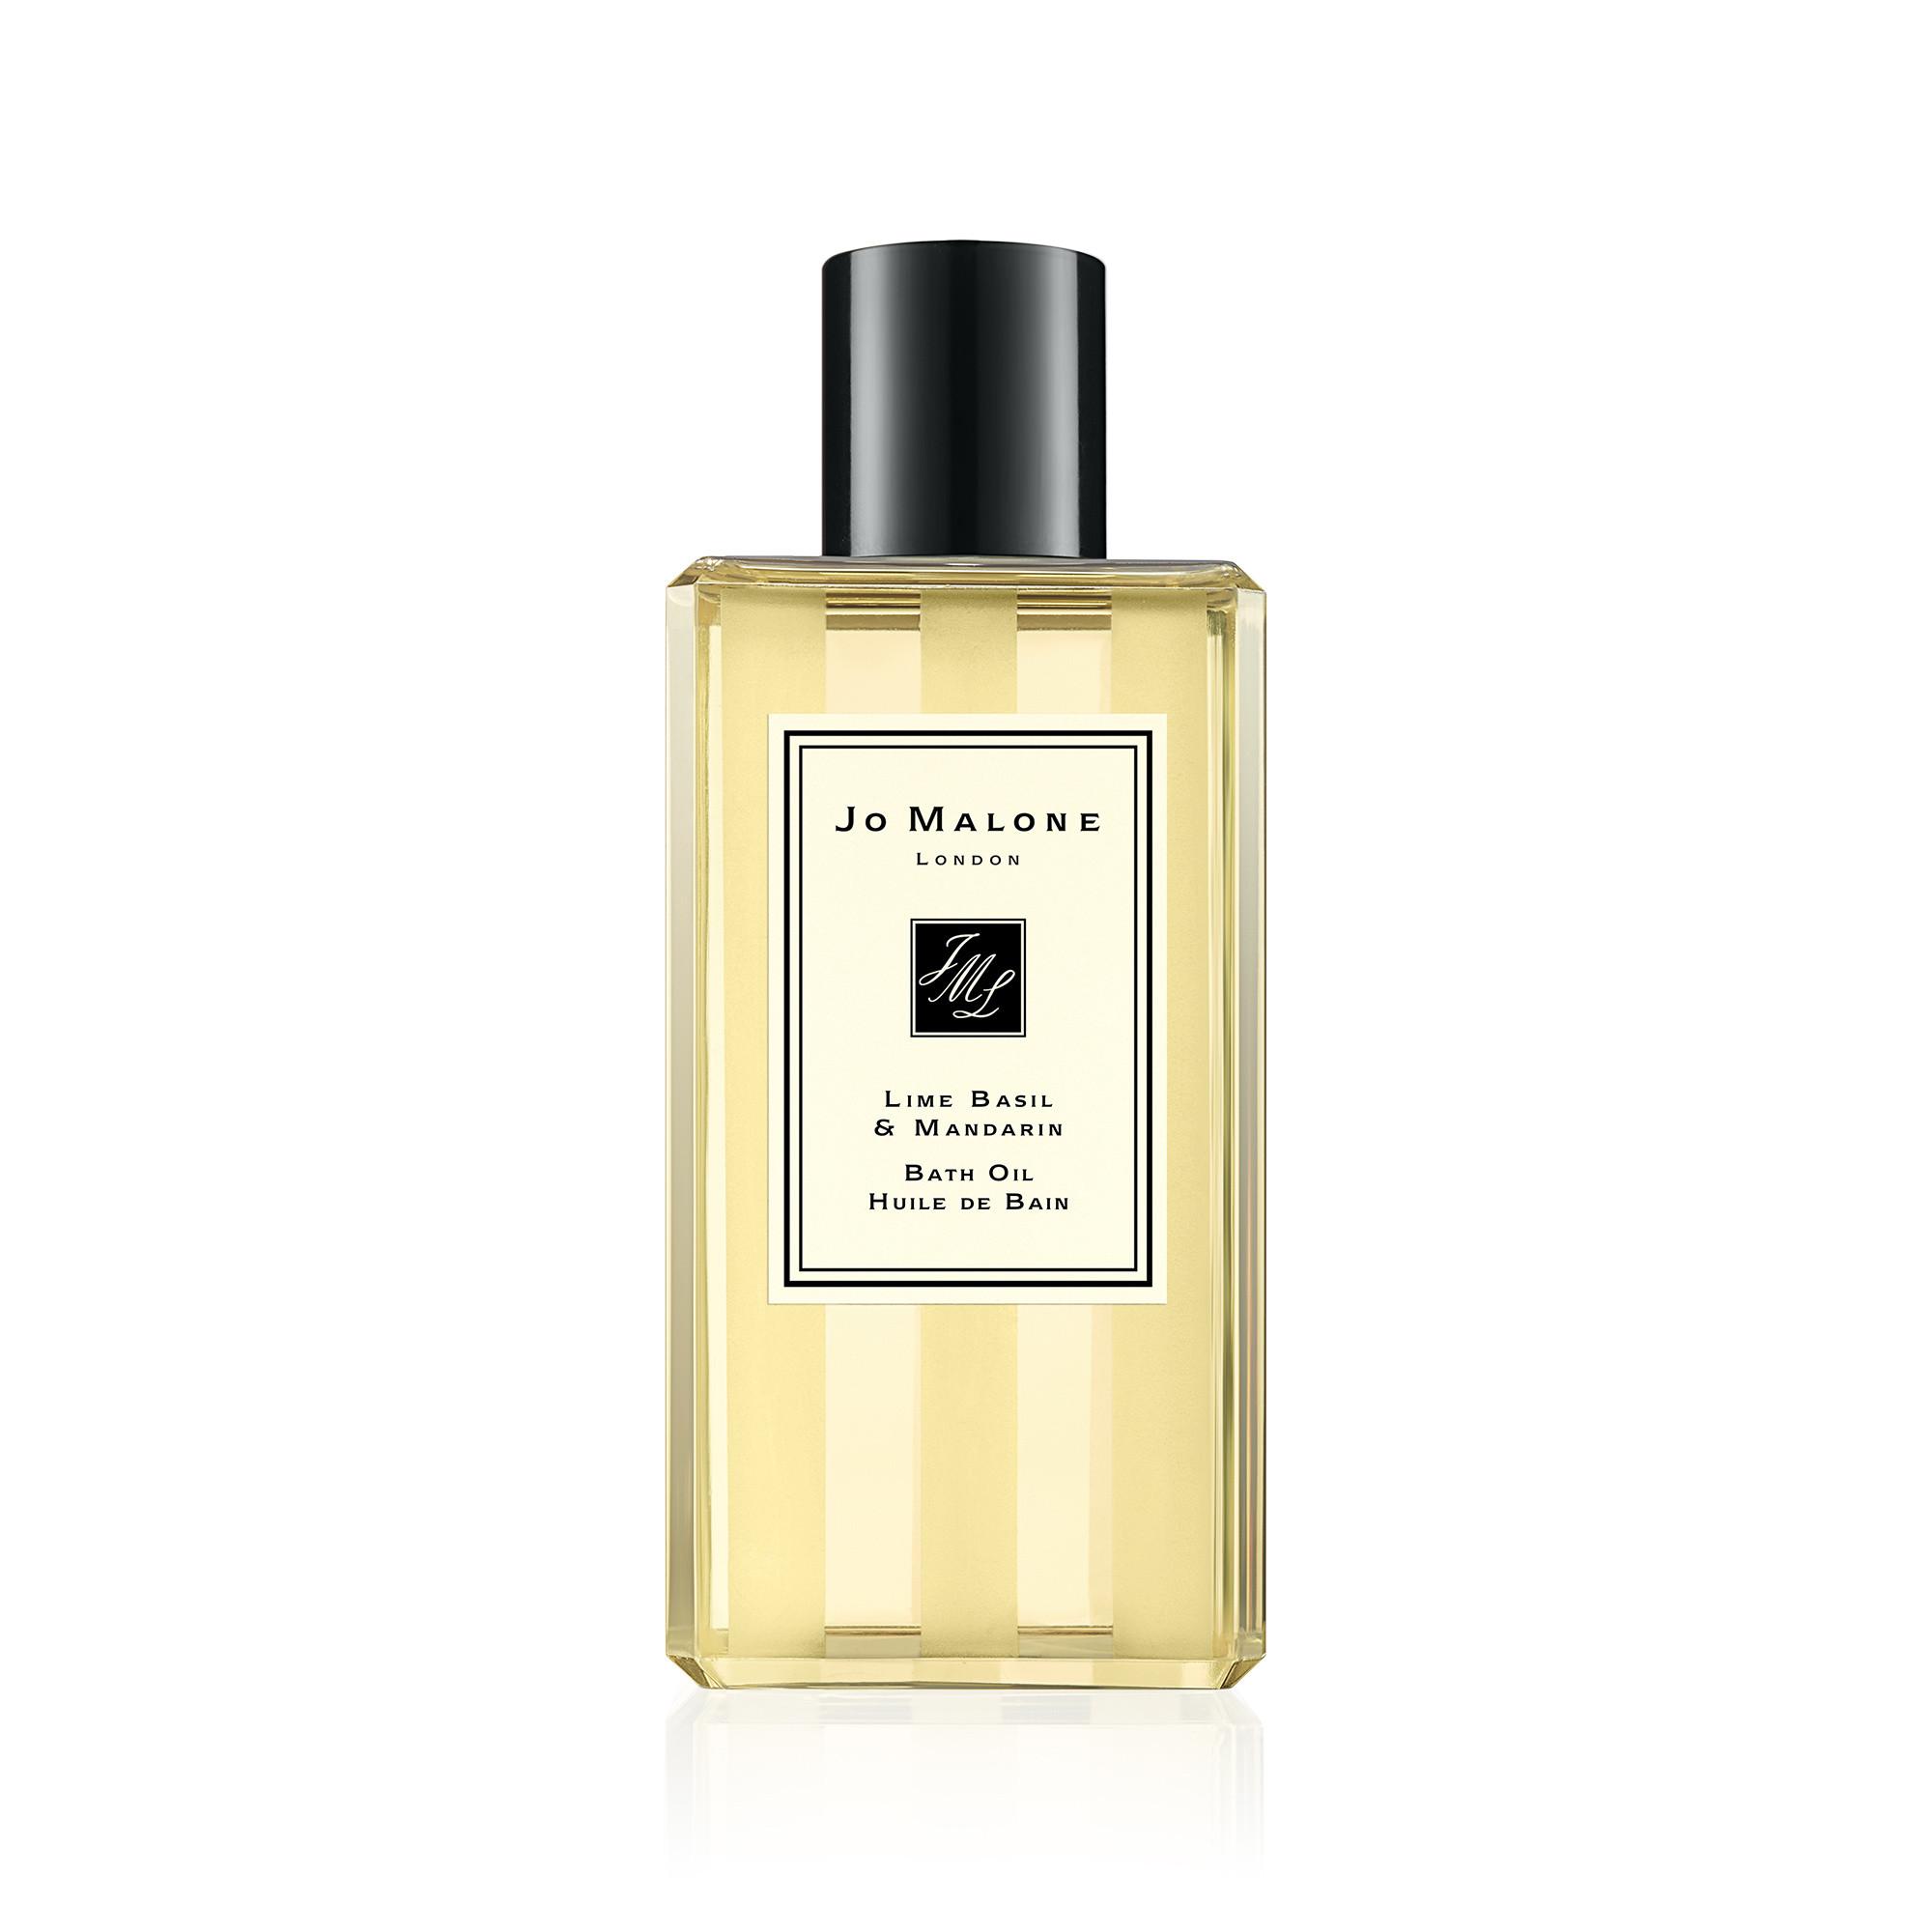 Jo Malone London lime basil & mandarin bath oil 250 ml, Beige, large image number 0